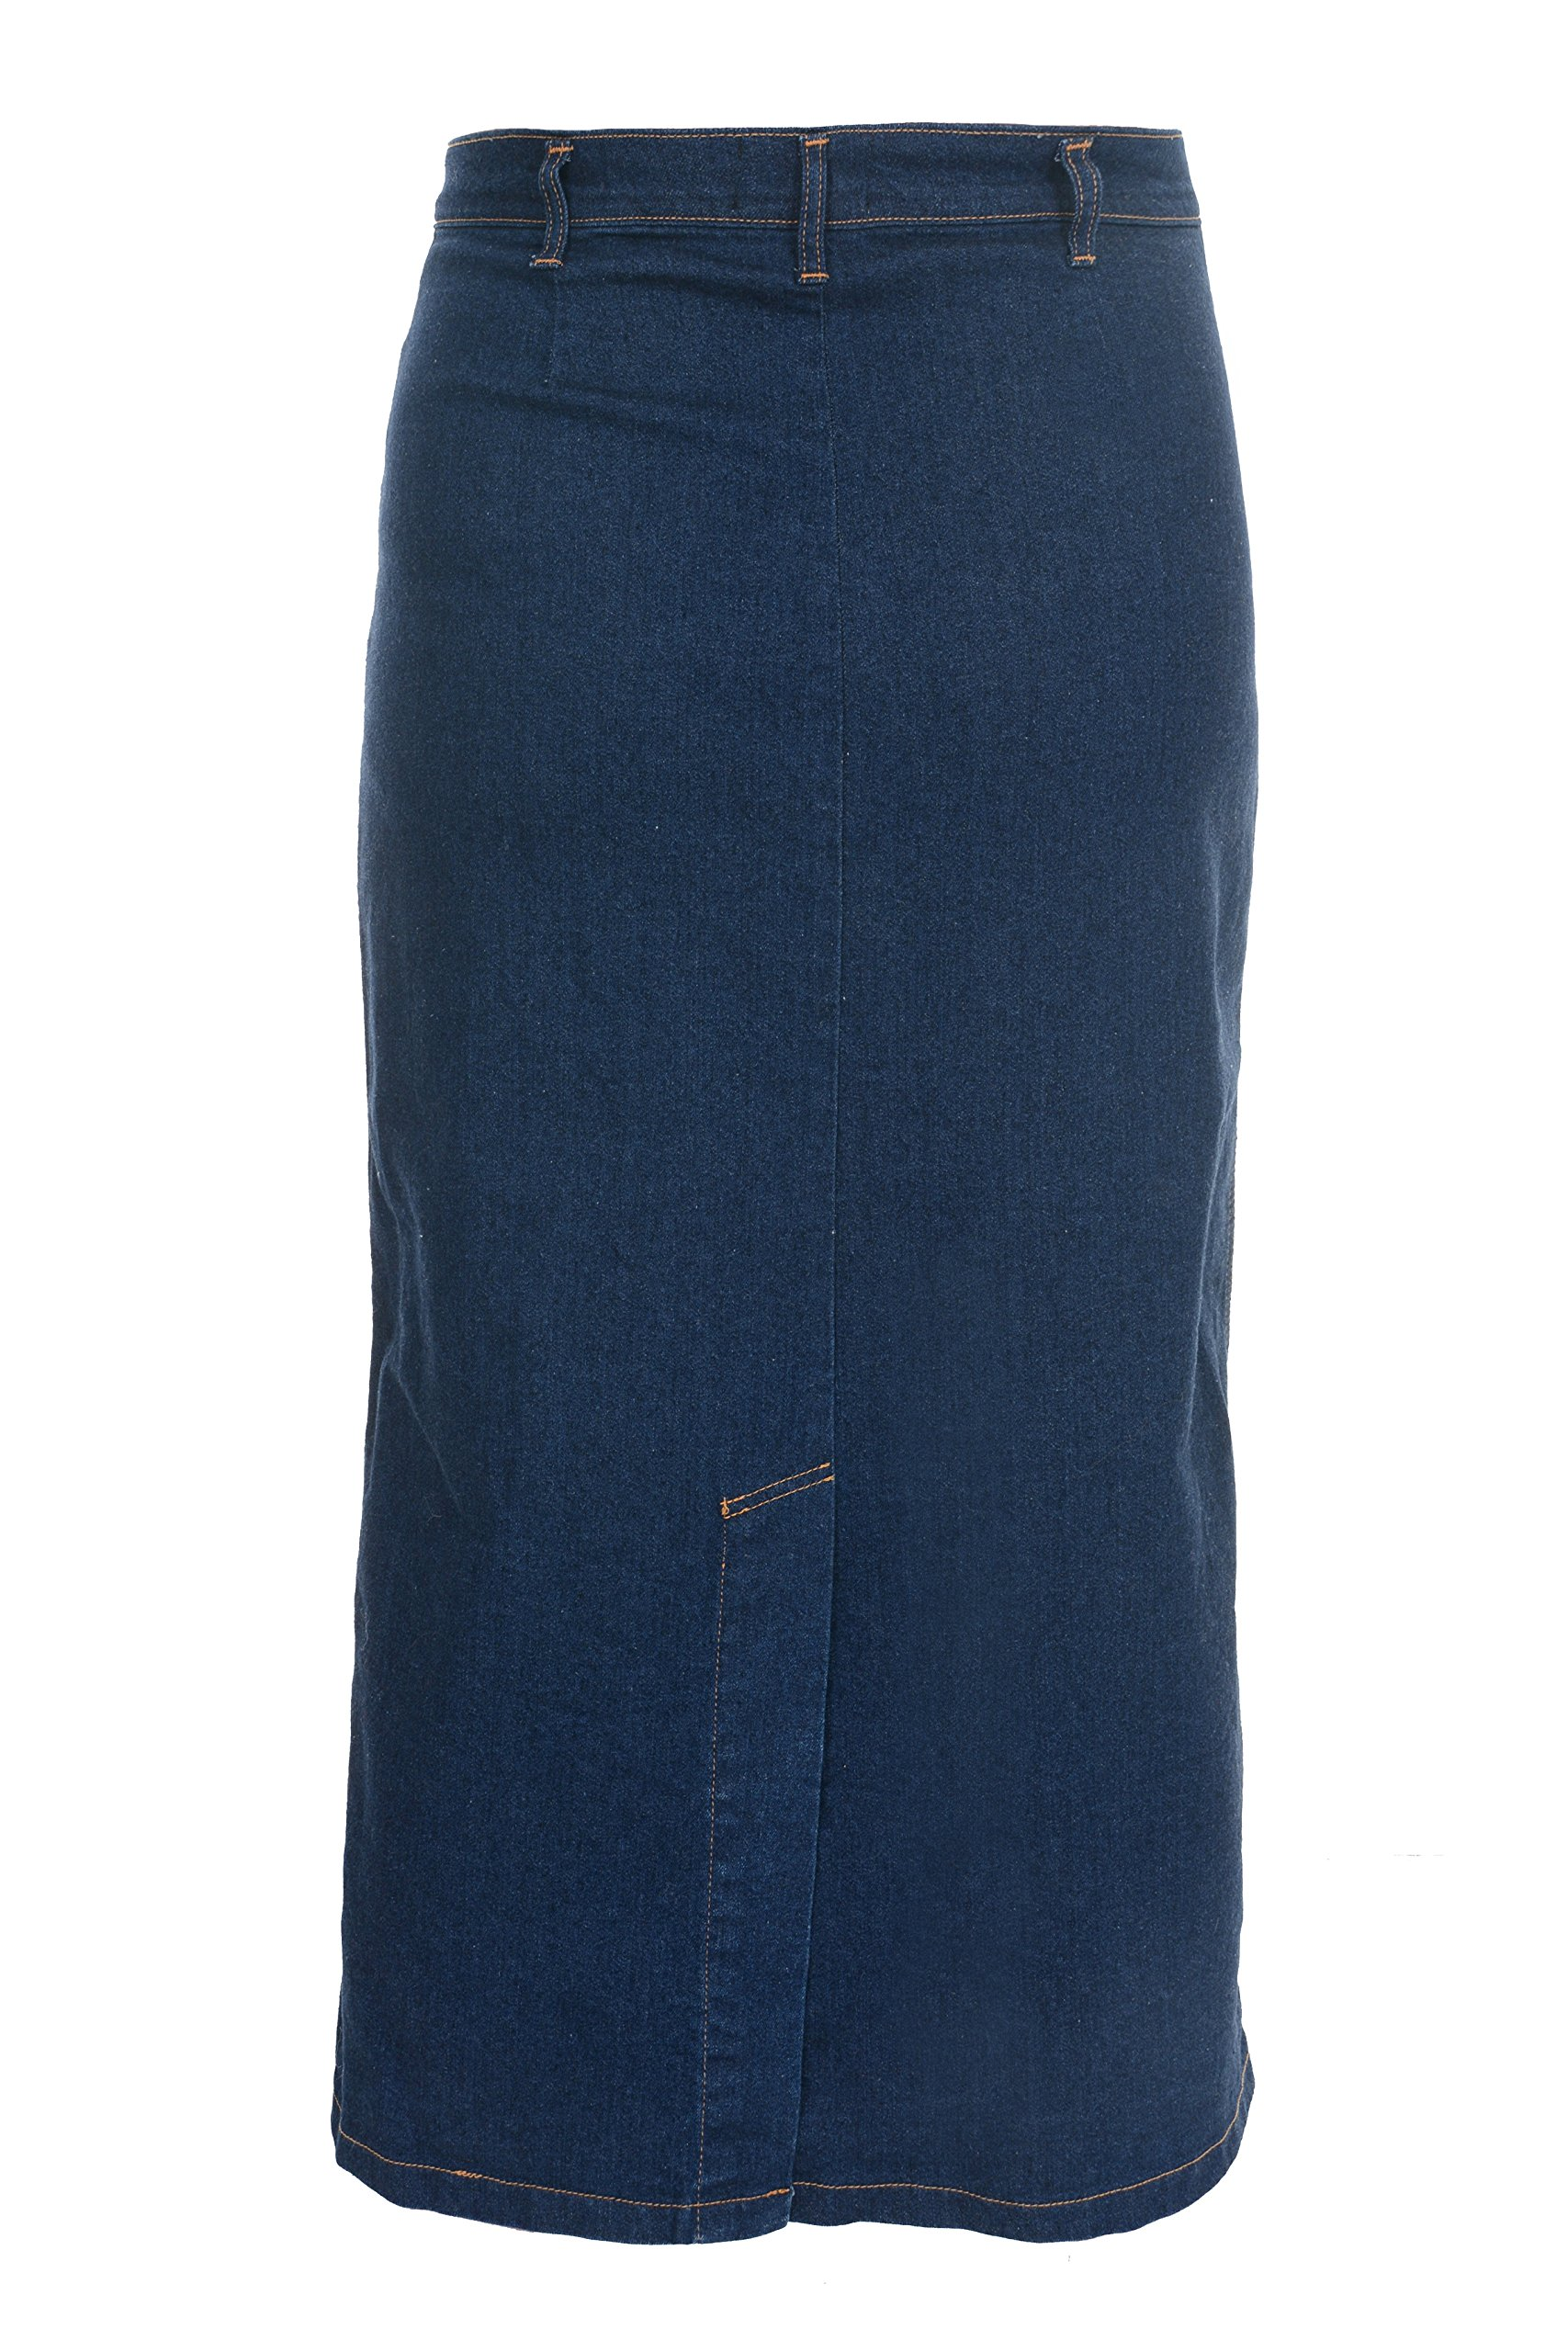 70269051593 Ice Cool Ladies Women s Indigo Stretch Denim Maxi Skirt Sizes 10 to ...